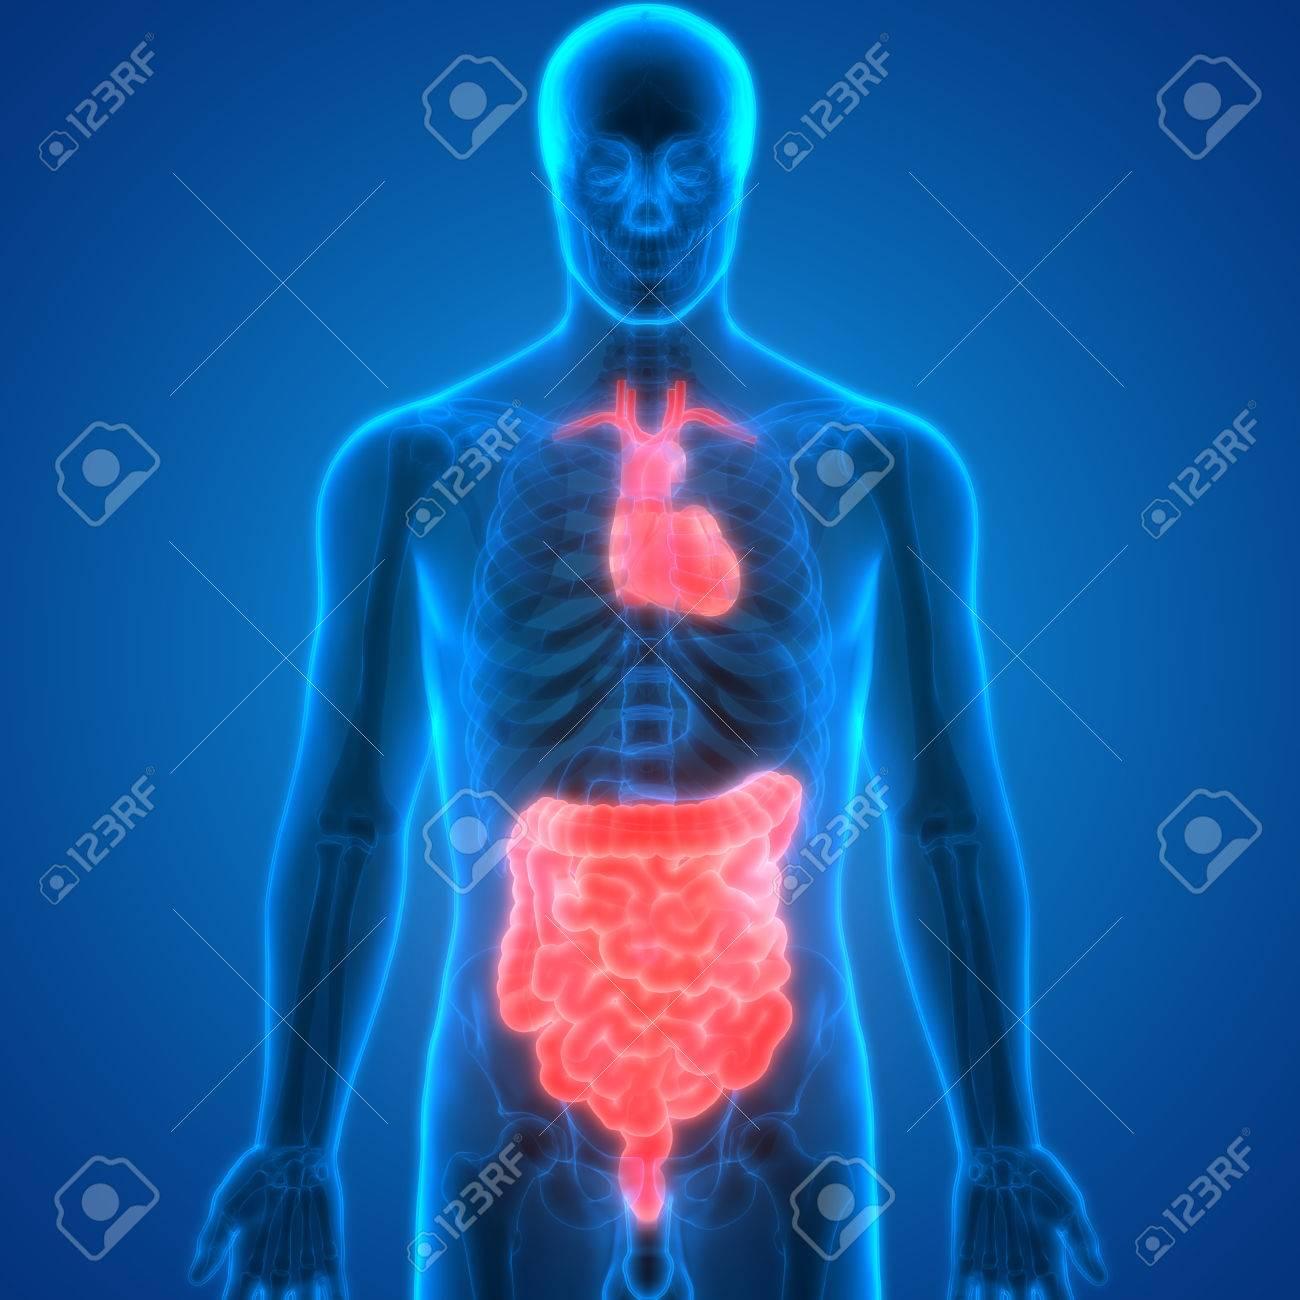 Human Body Organs Anatomy (Heart With Intestine) Stock Photo ...